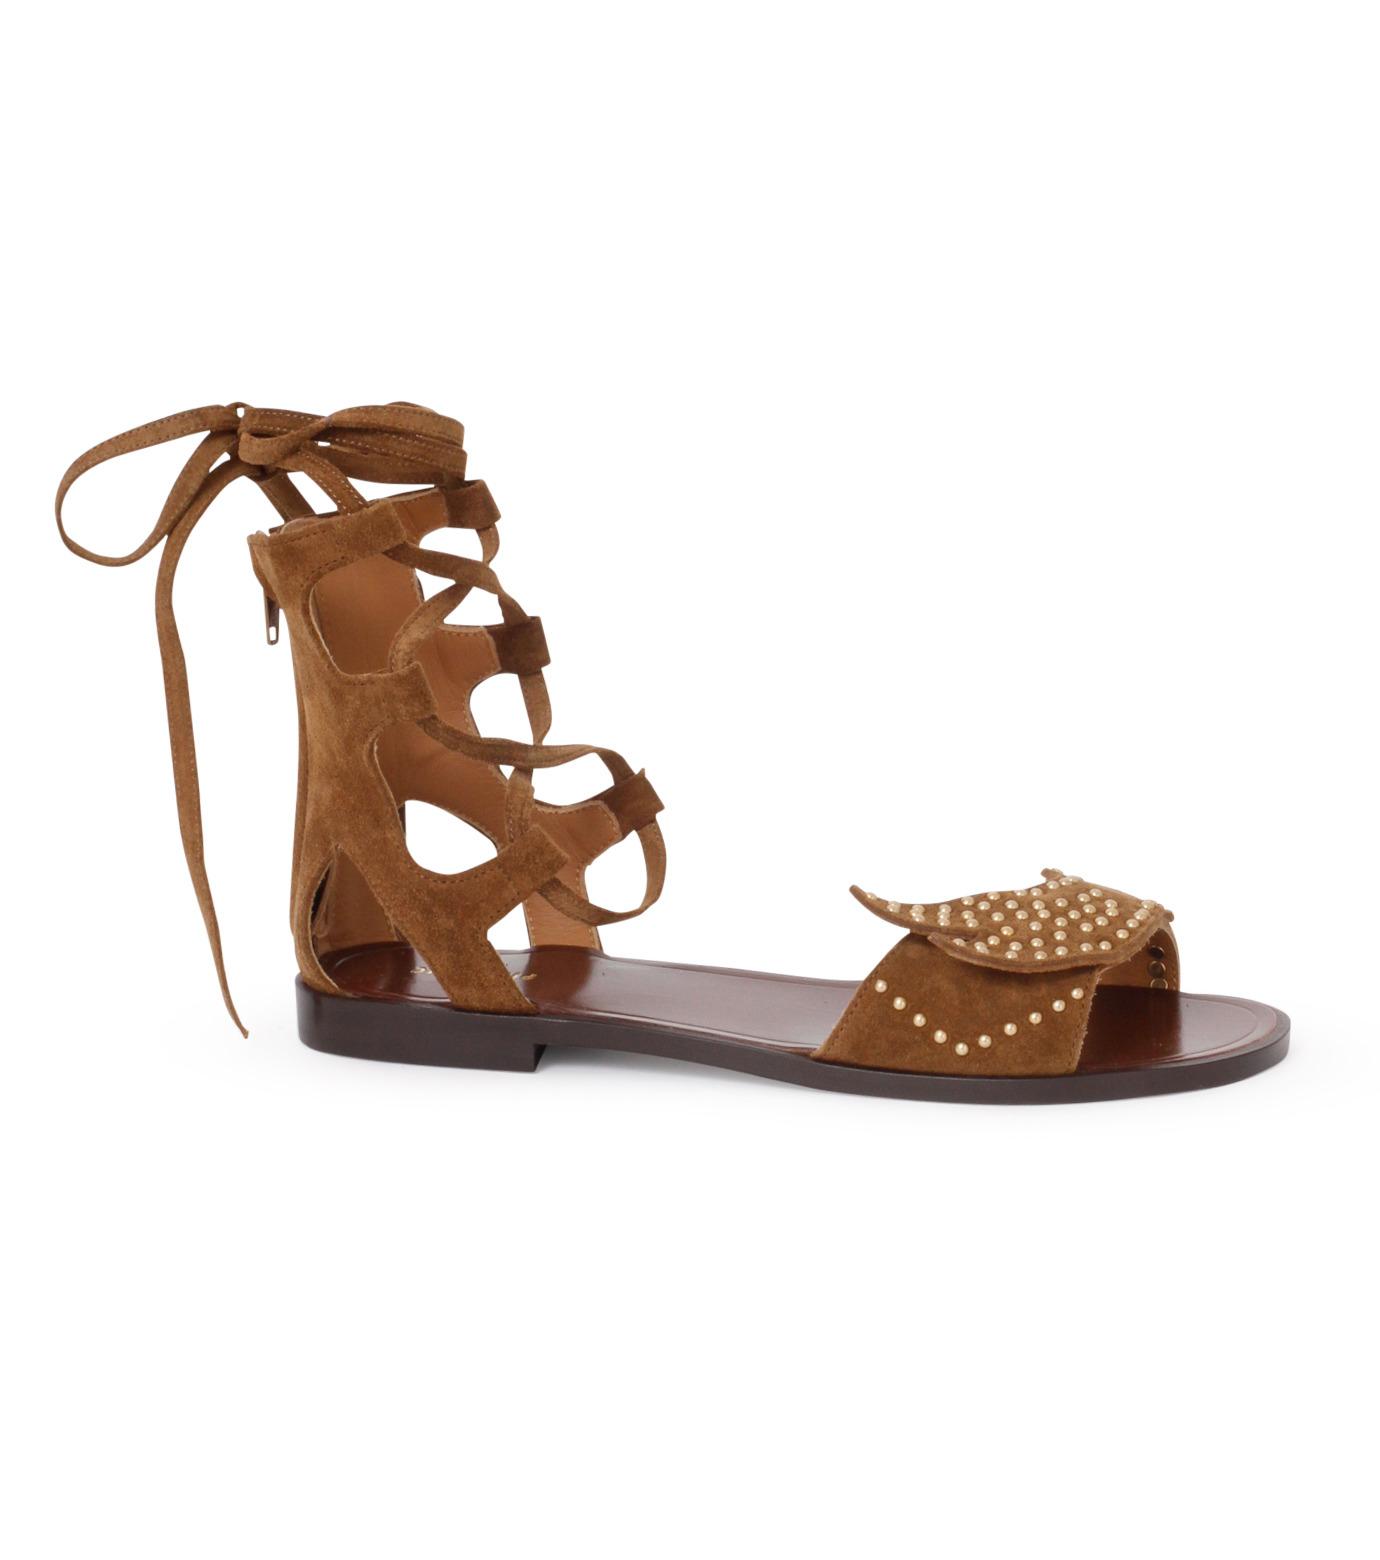 PIPPICHIC(ピッピシック)のbird lace-up flat sandal-BROWN(シューズ/shoes)-PP16S-BIRD24-42 拡大詳細画像1